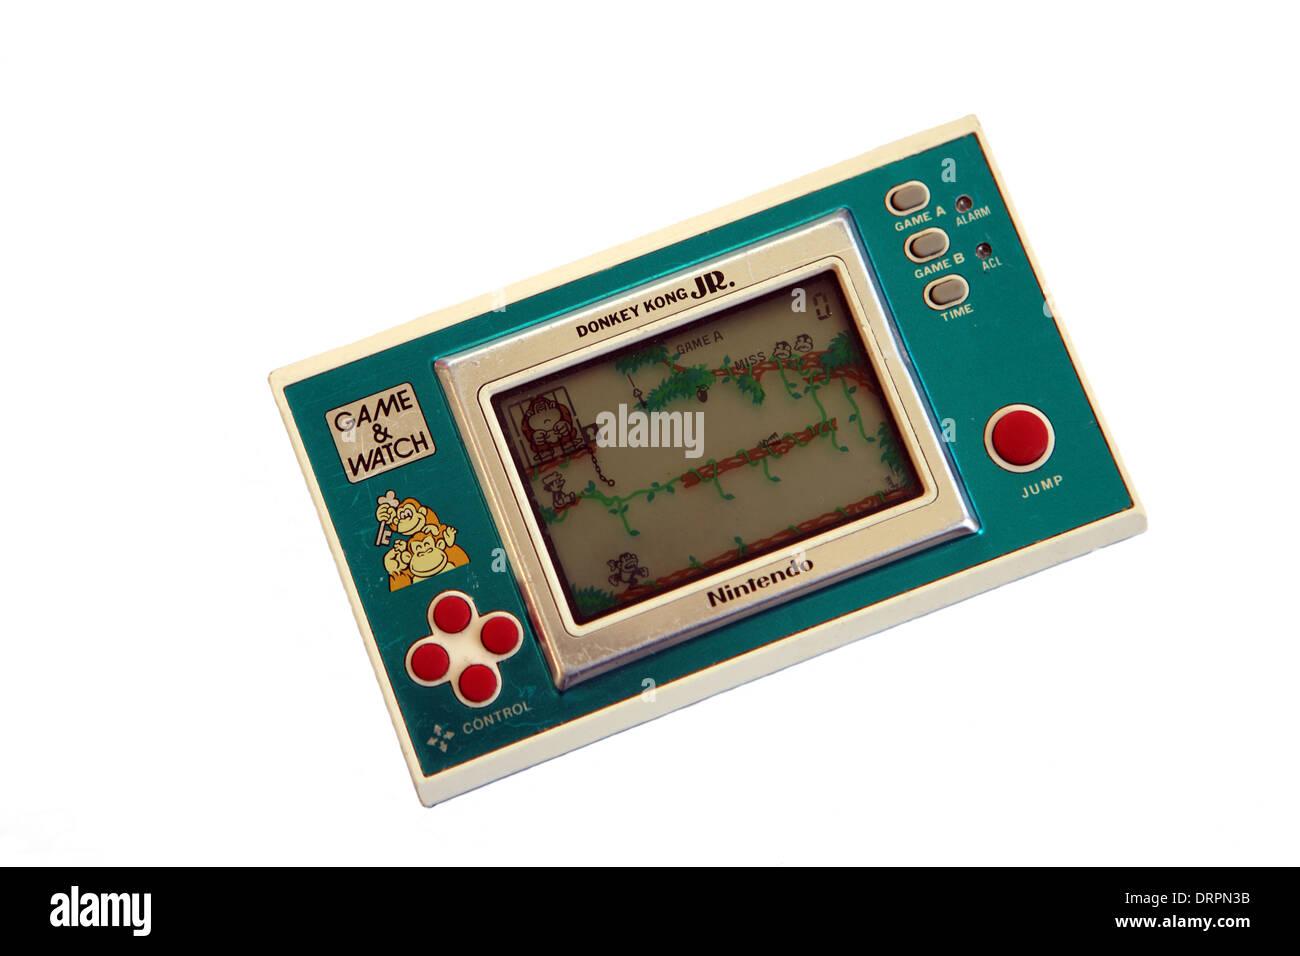 Nintendo Donkey Kong Jr 80 Juegos Electronicos De Mano Foto Imagen